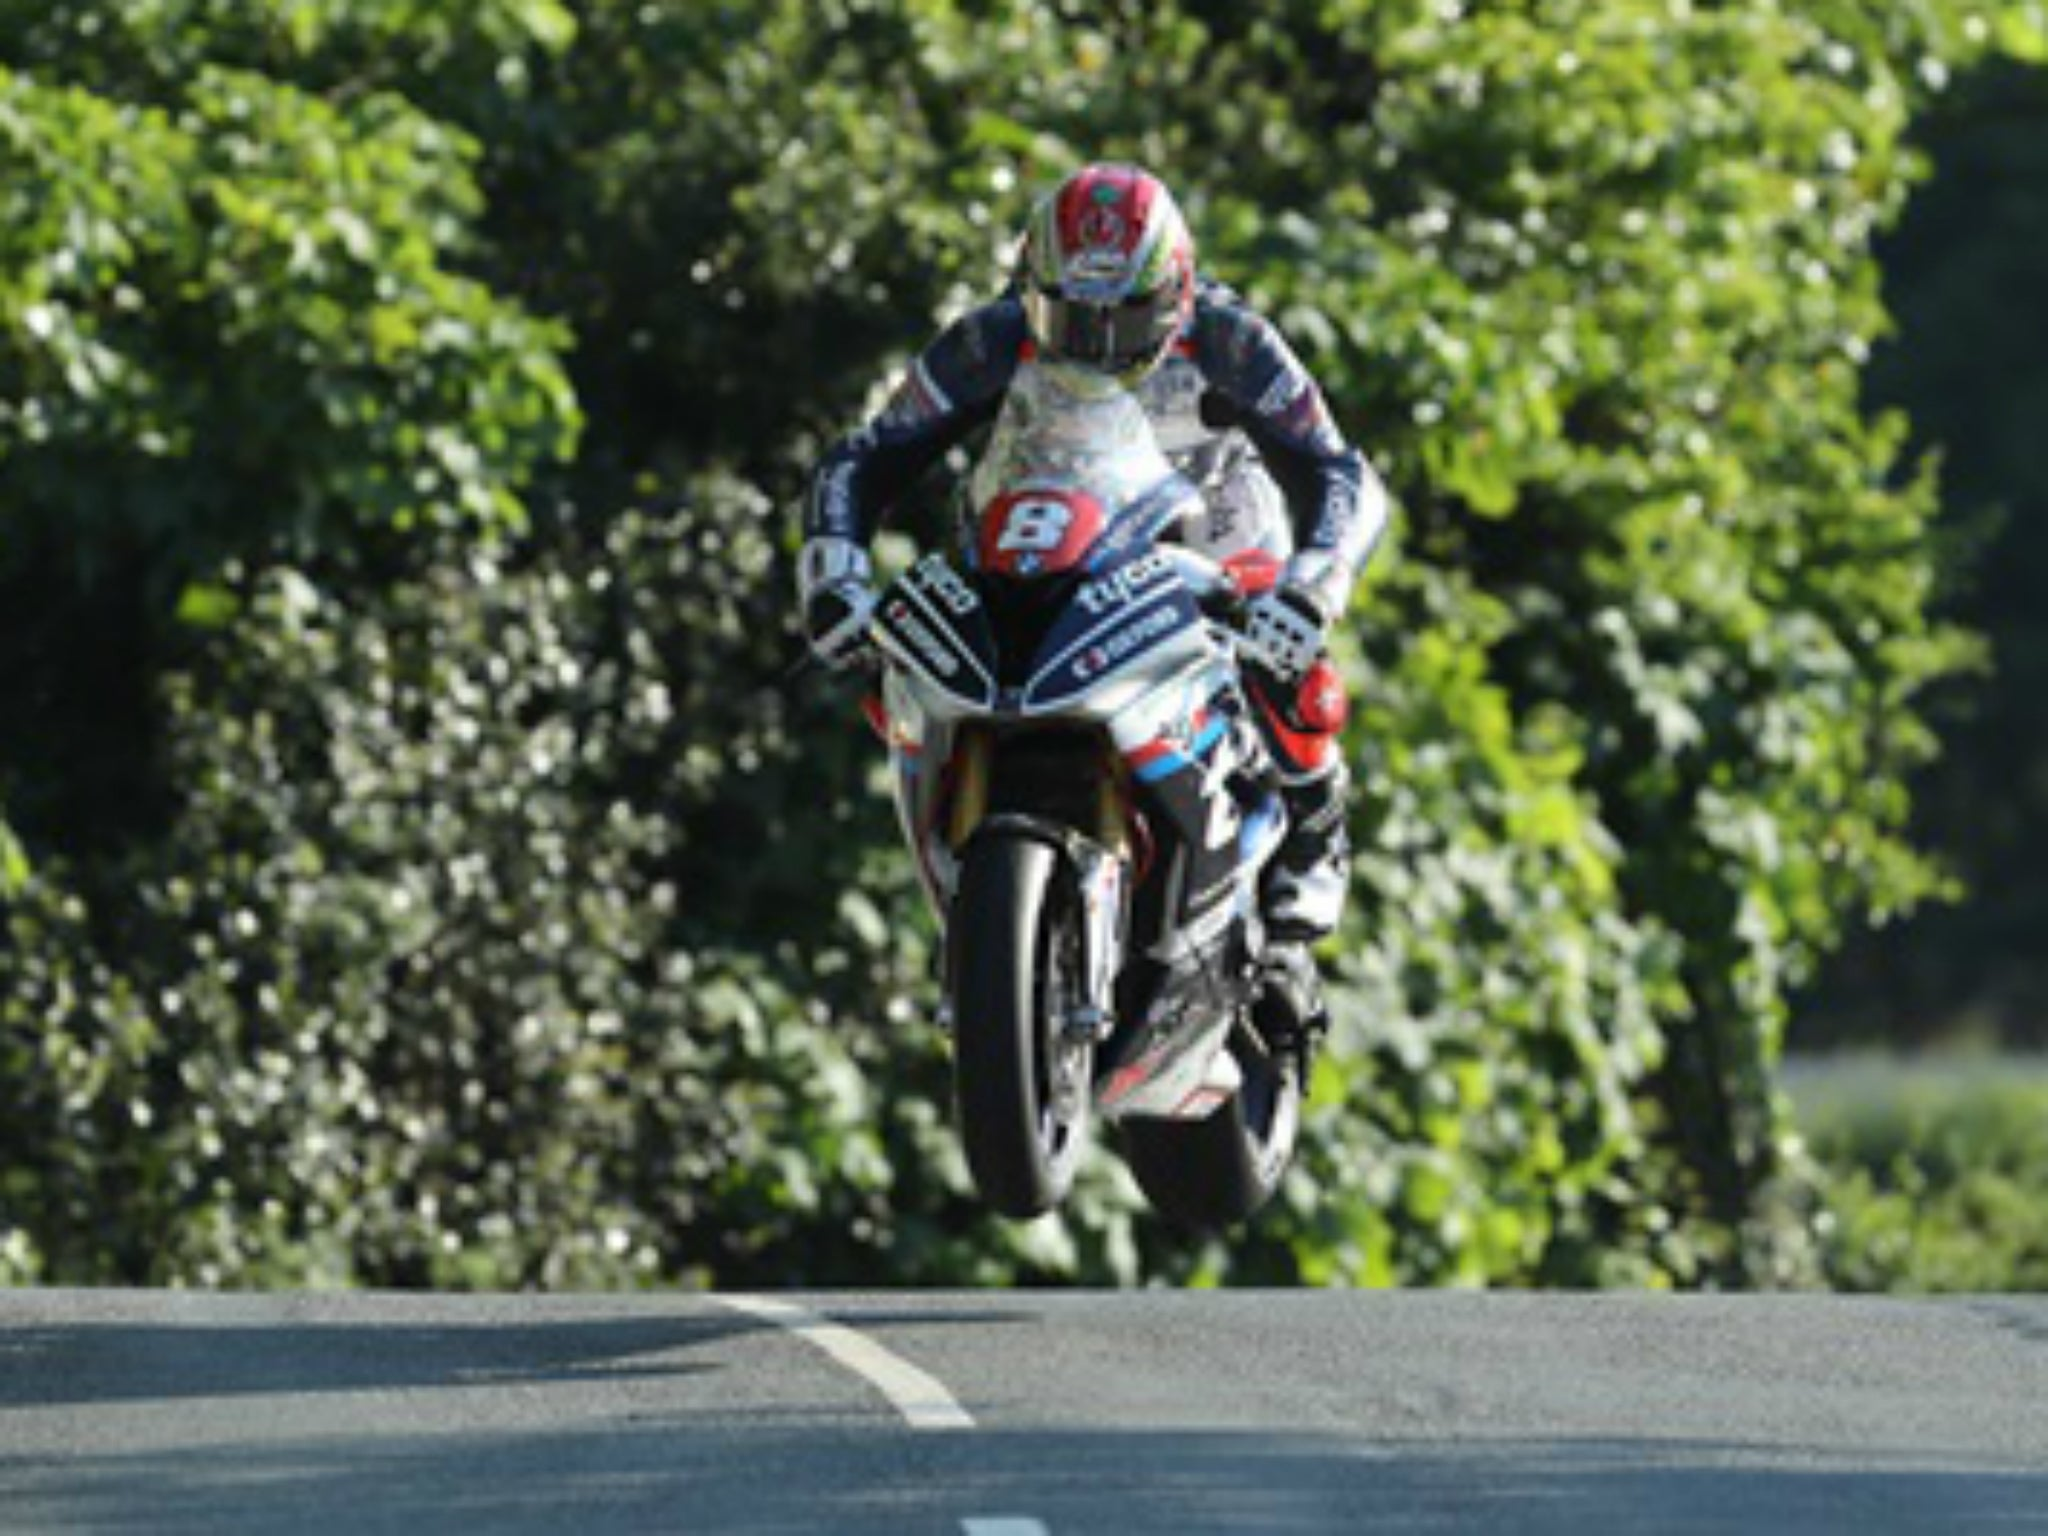 Dan Kneen dead: Isle of Man TT rider dies in superbike practice